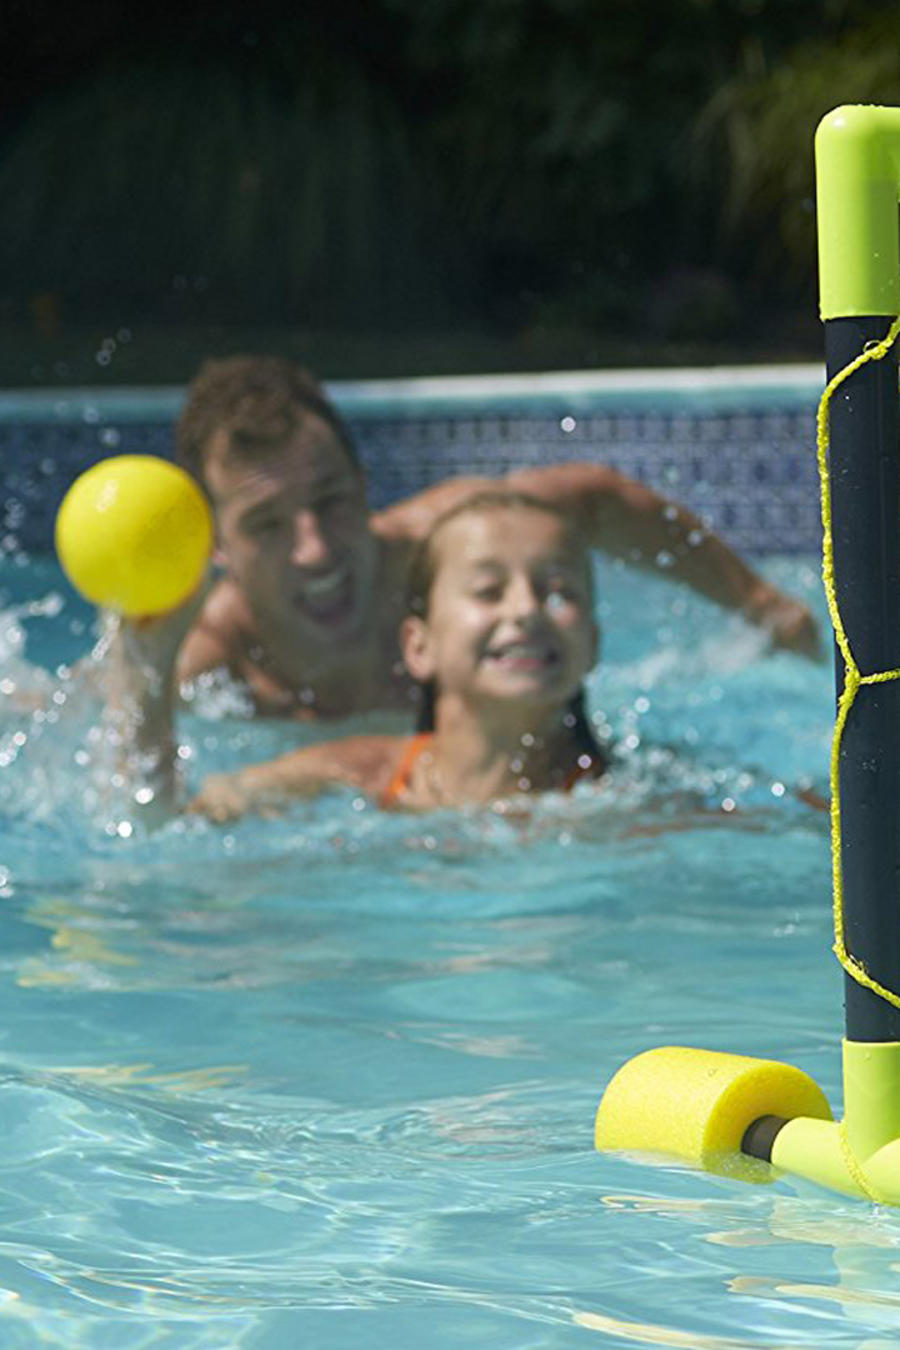 Juguetes para piscina en este verano